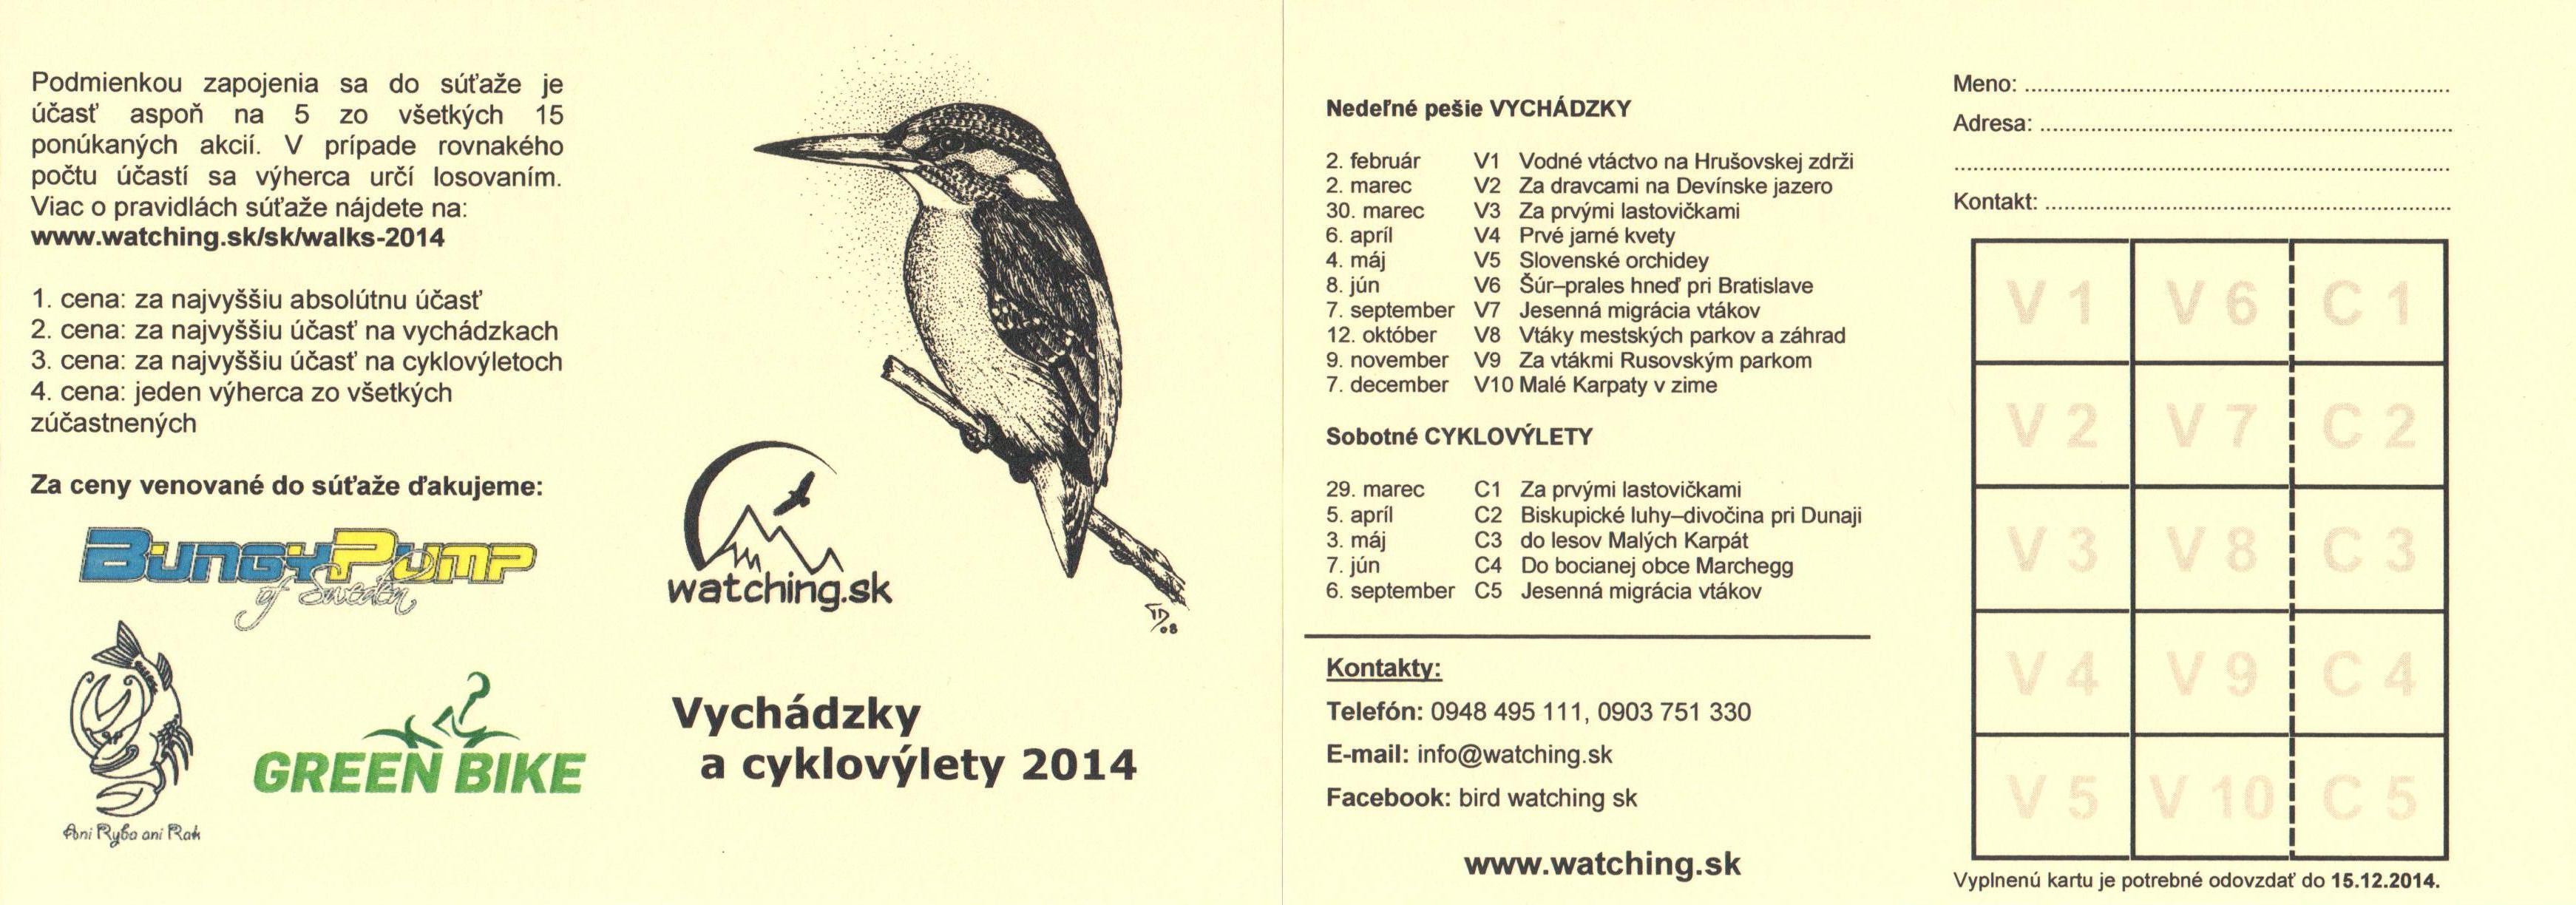 karticka_watching.sk